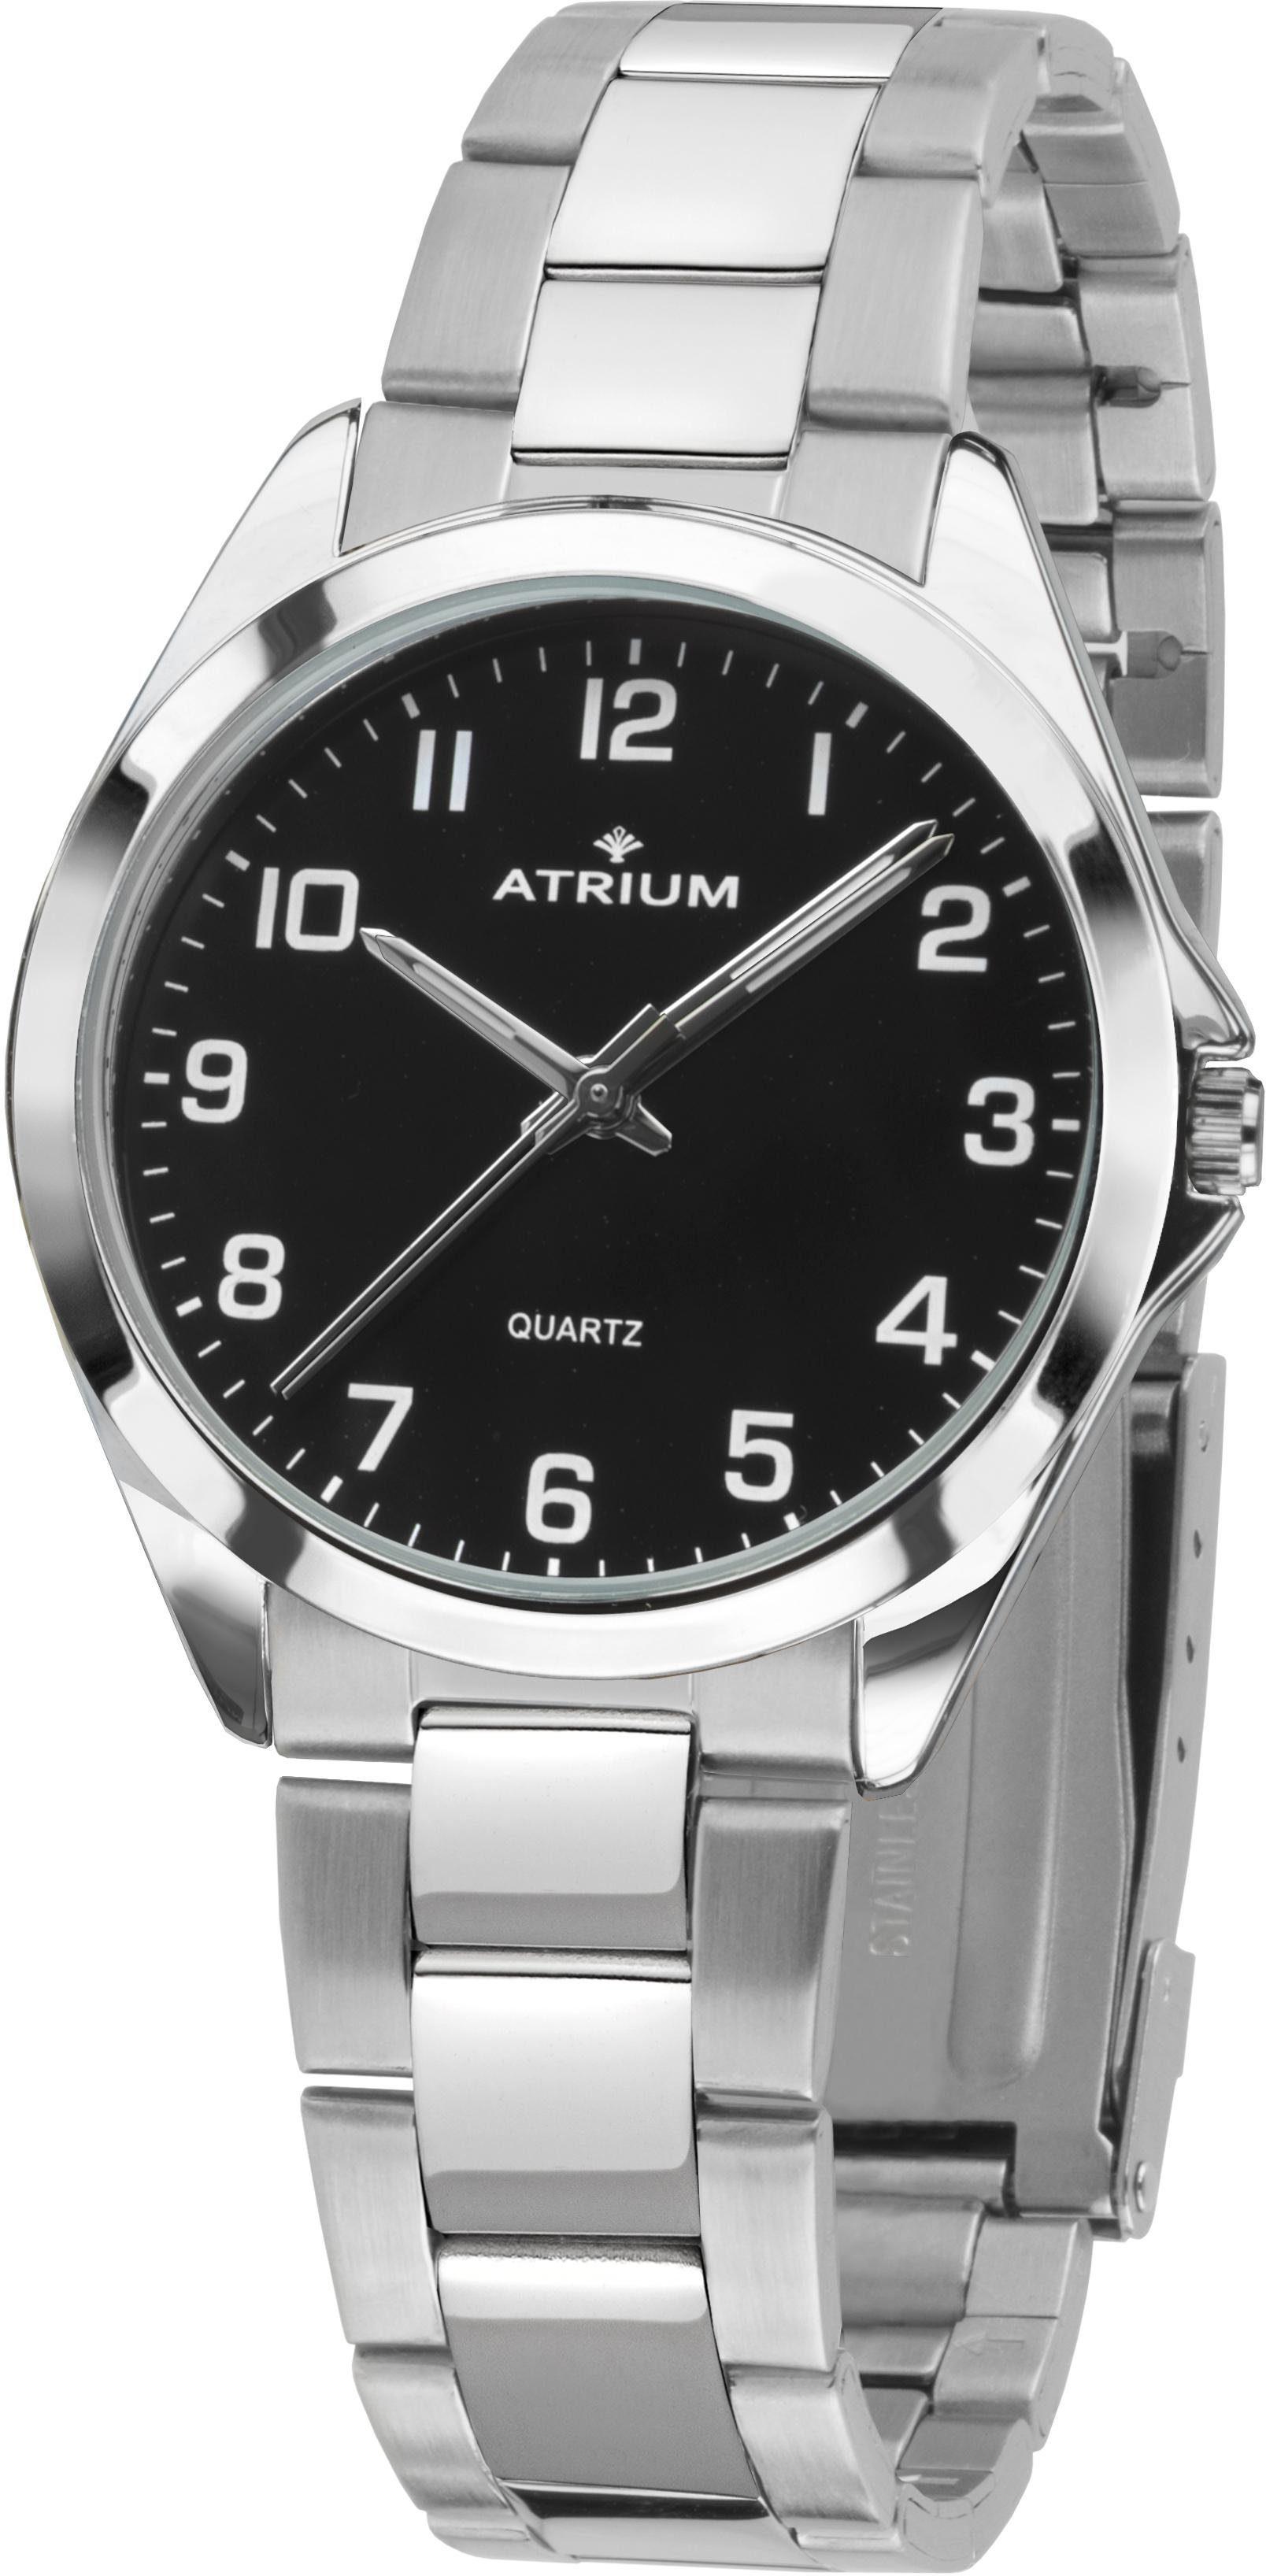 Atrium Quarzuhr »A10-31«